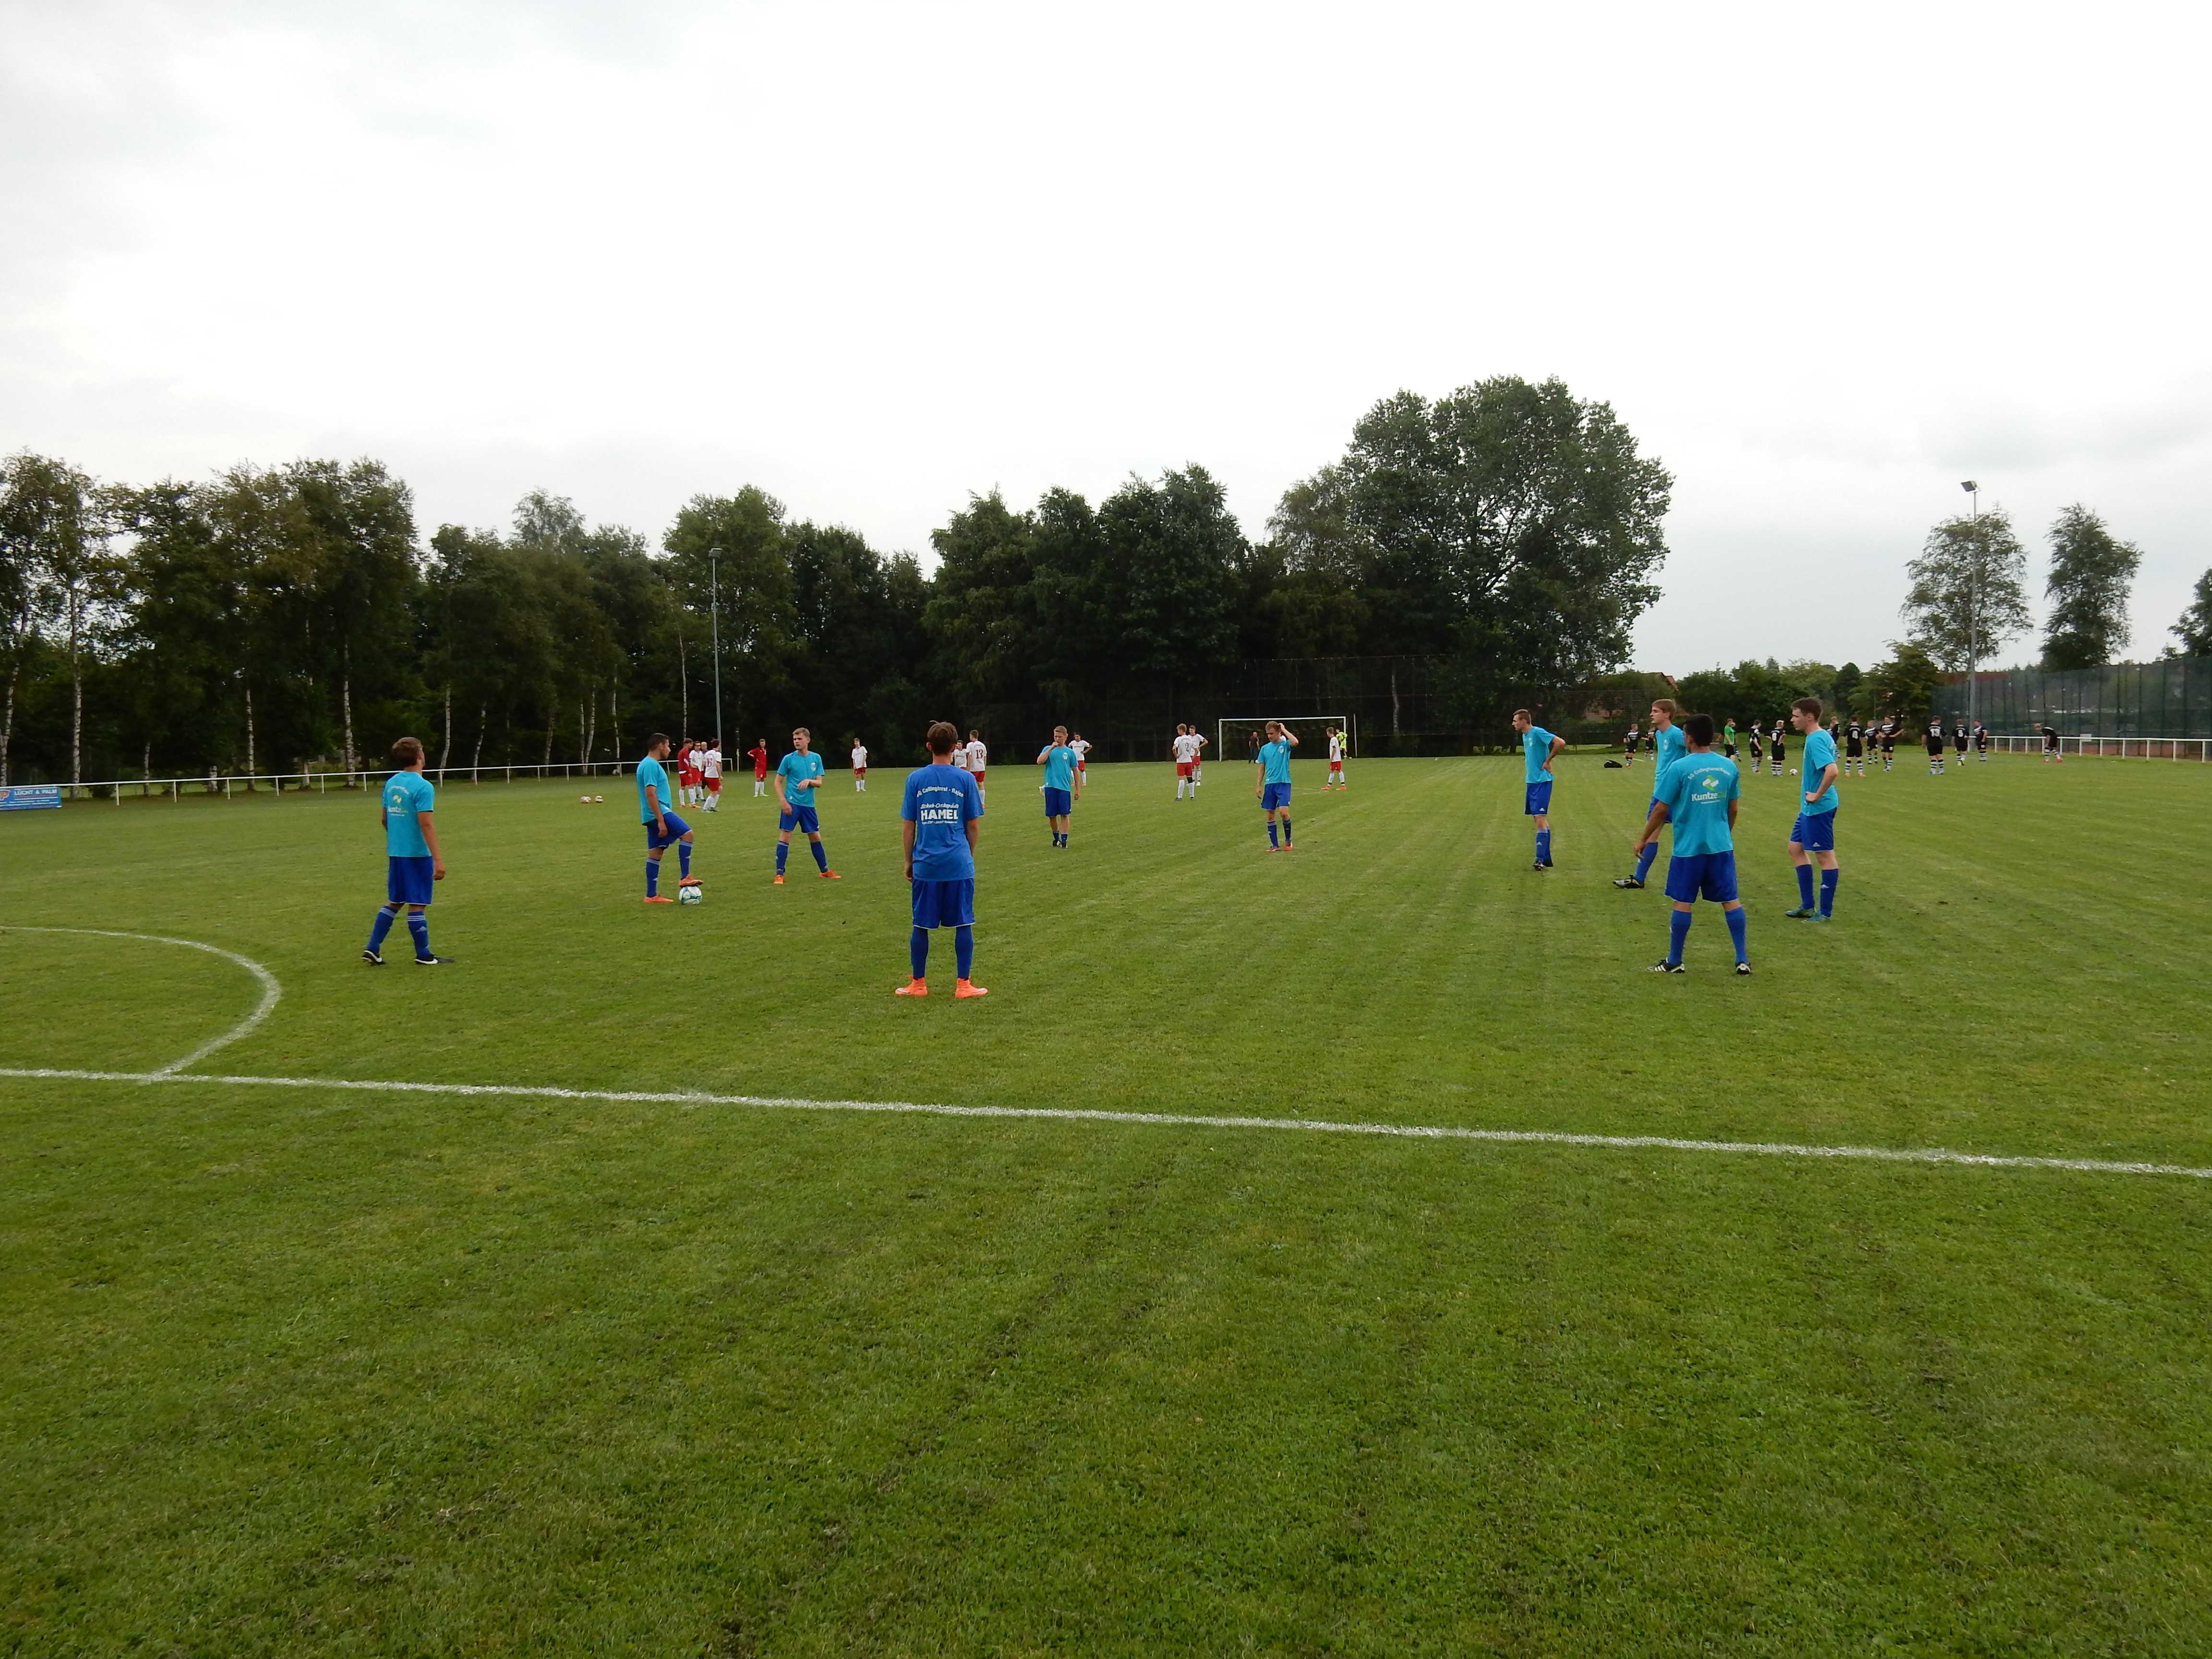 2016-07-28 Sportwoche - erster Donnerstag (11)